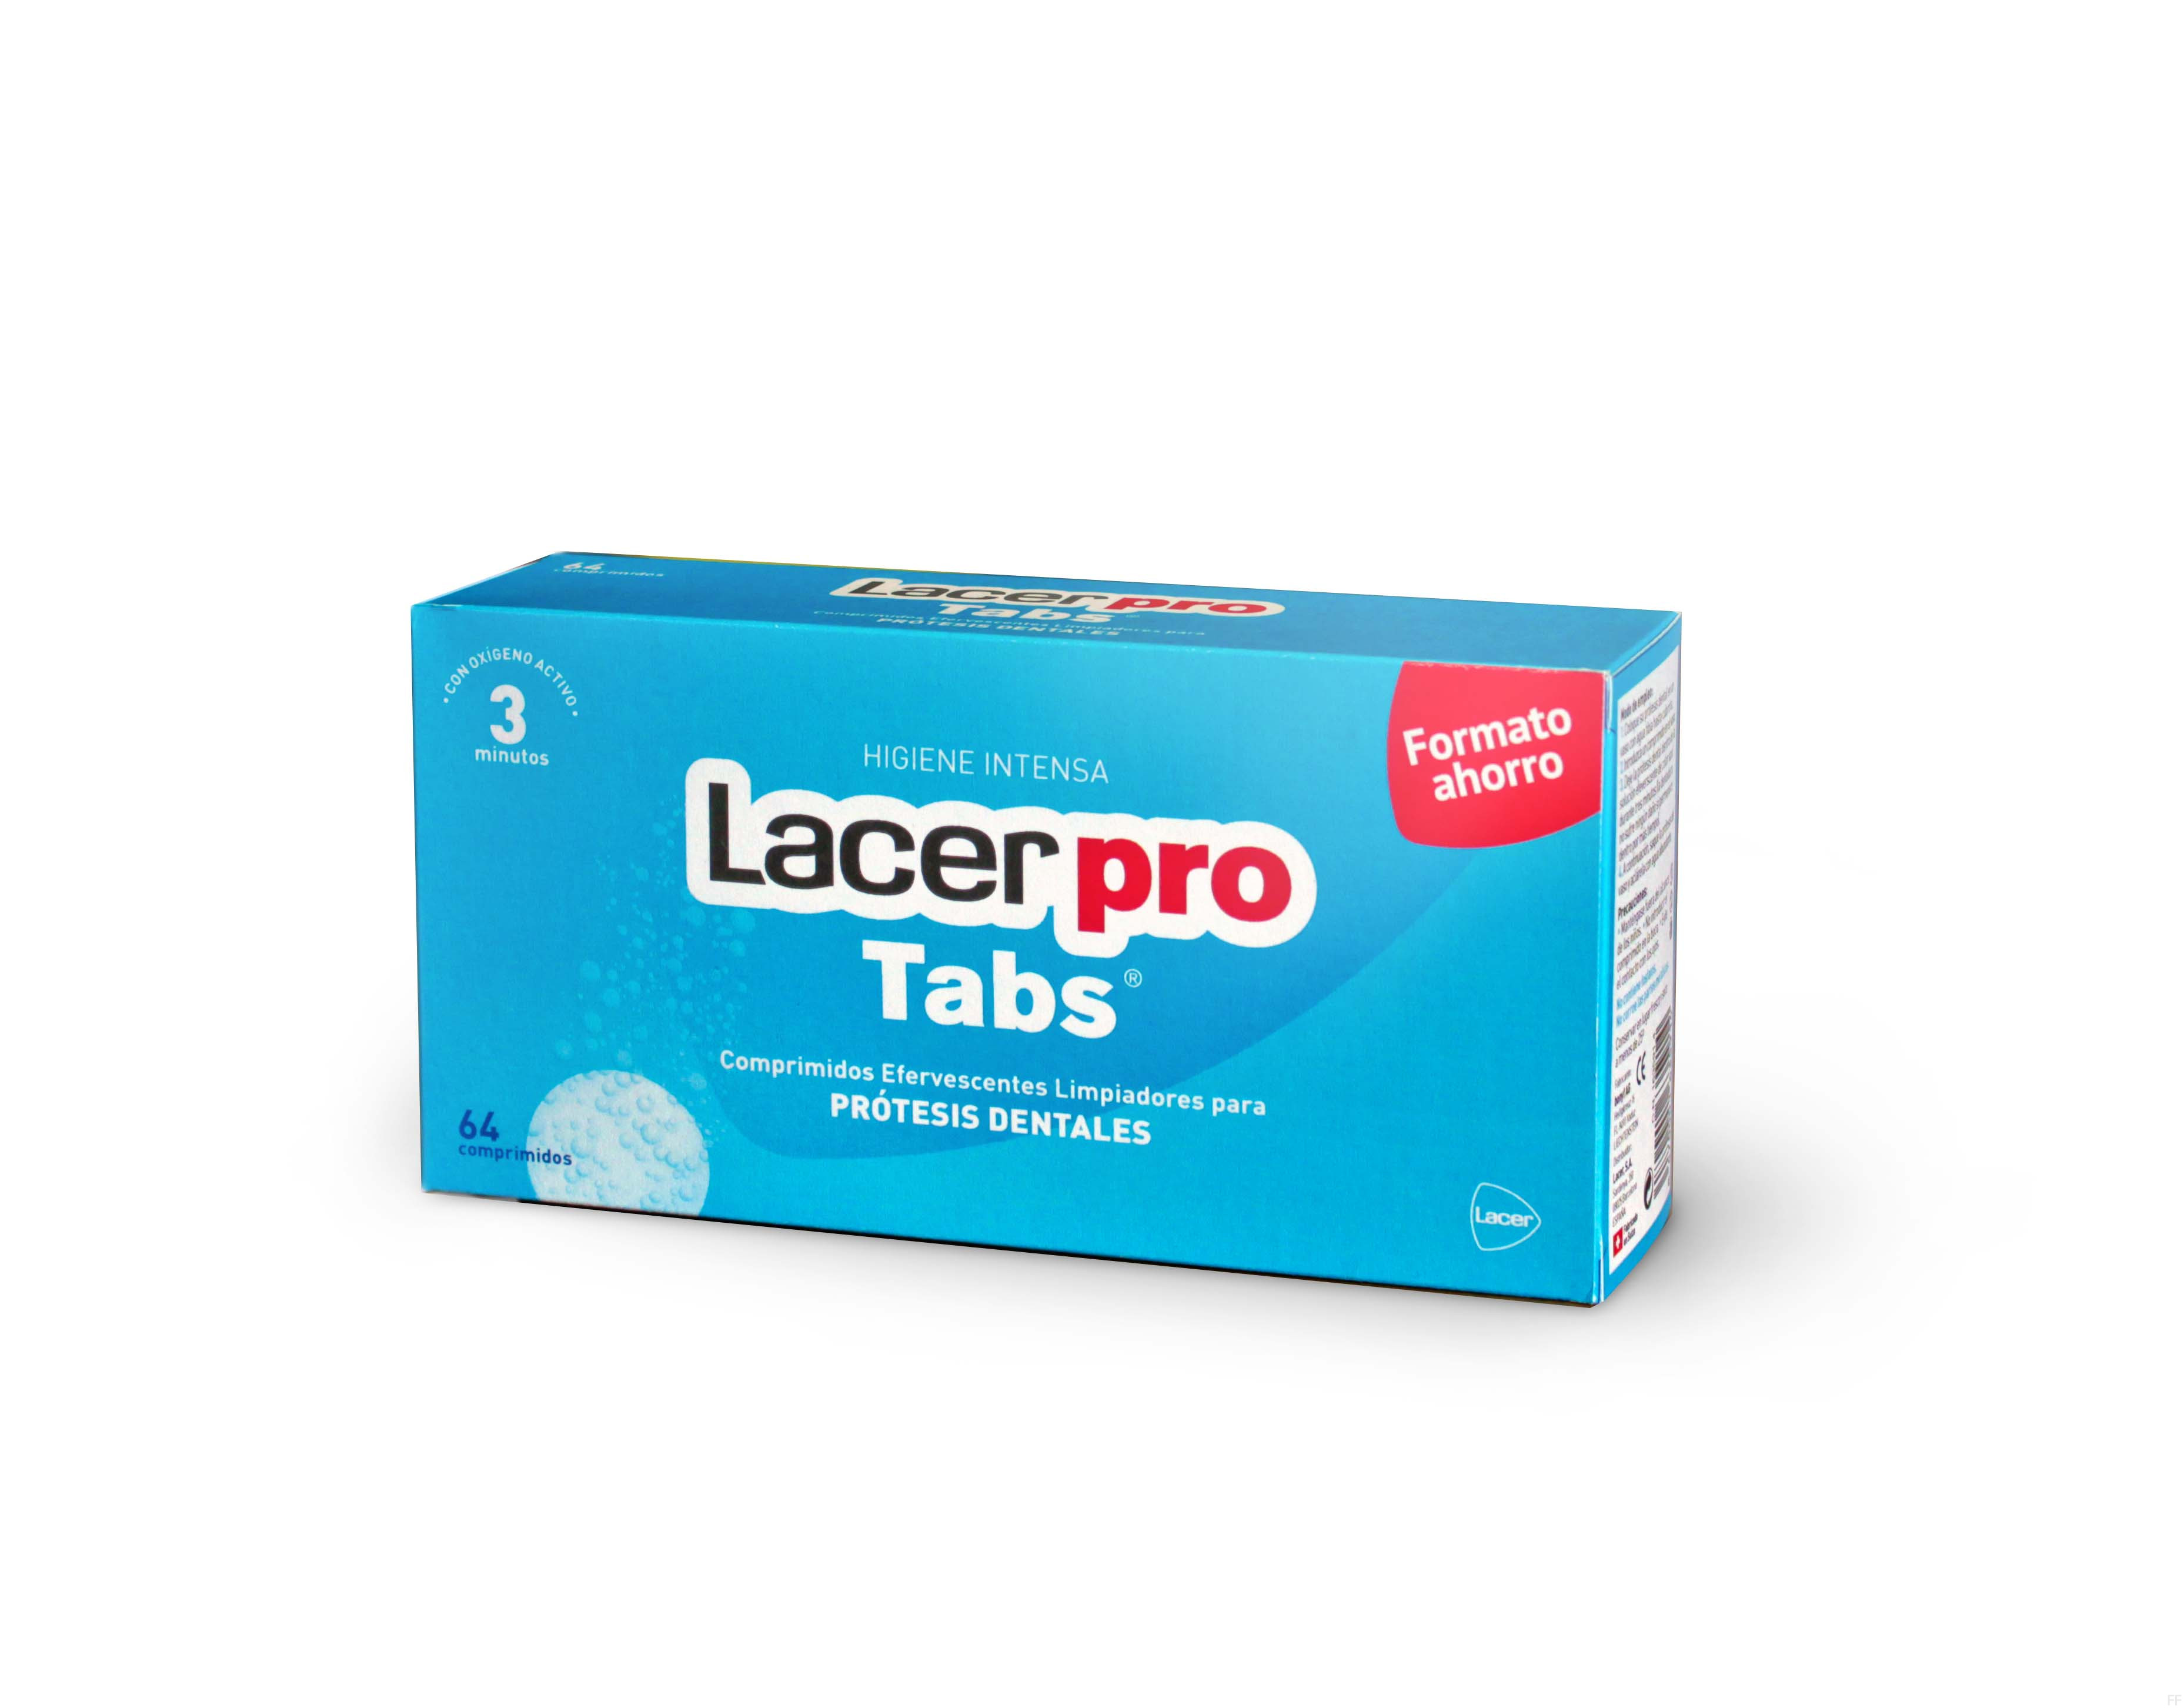 Lacer Pro Tabs 64 comprimidos efervescentes